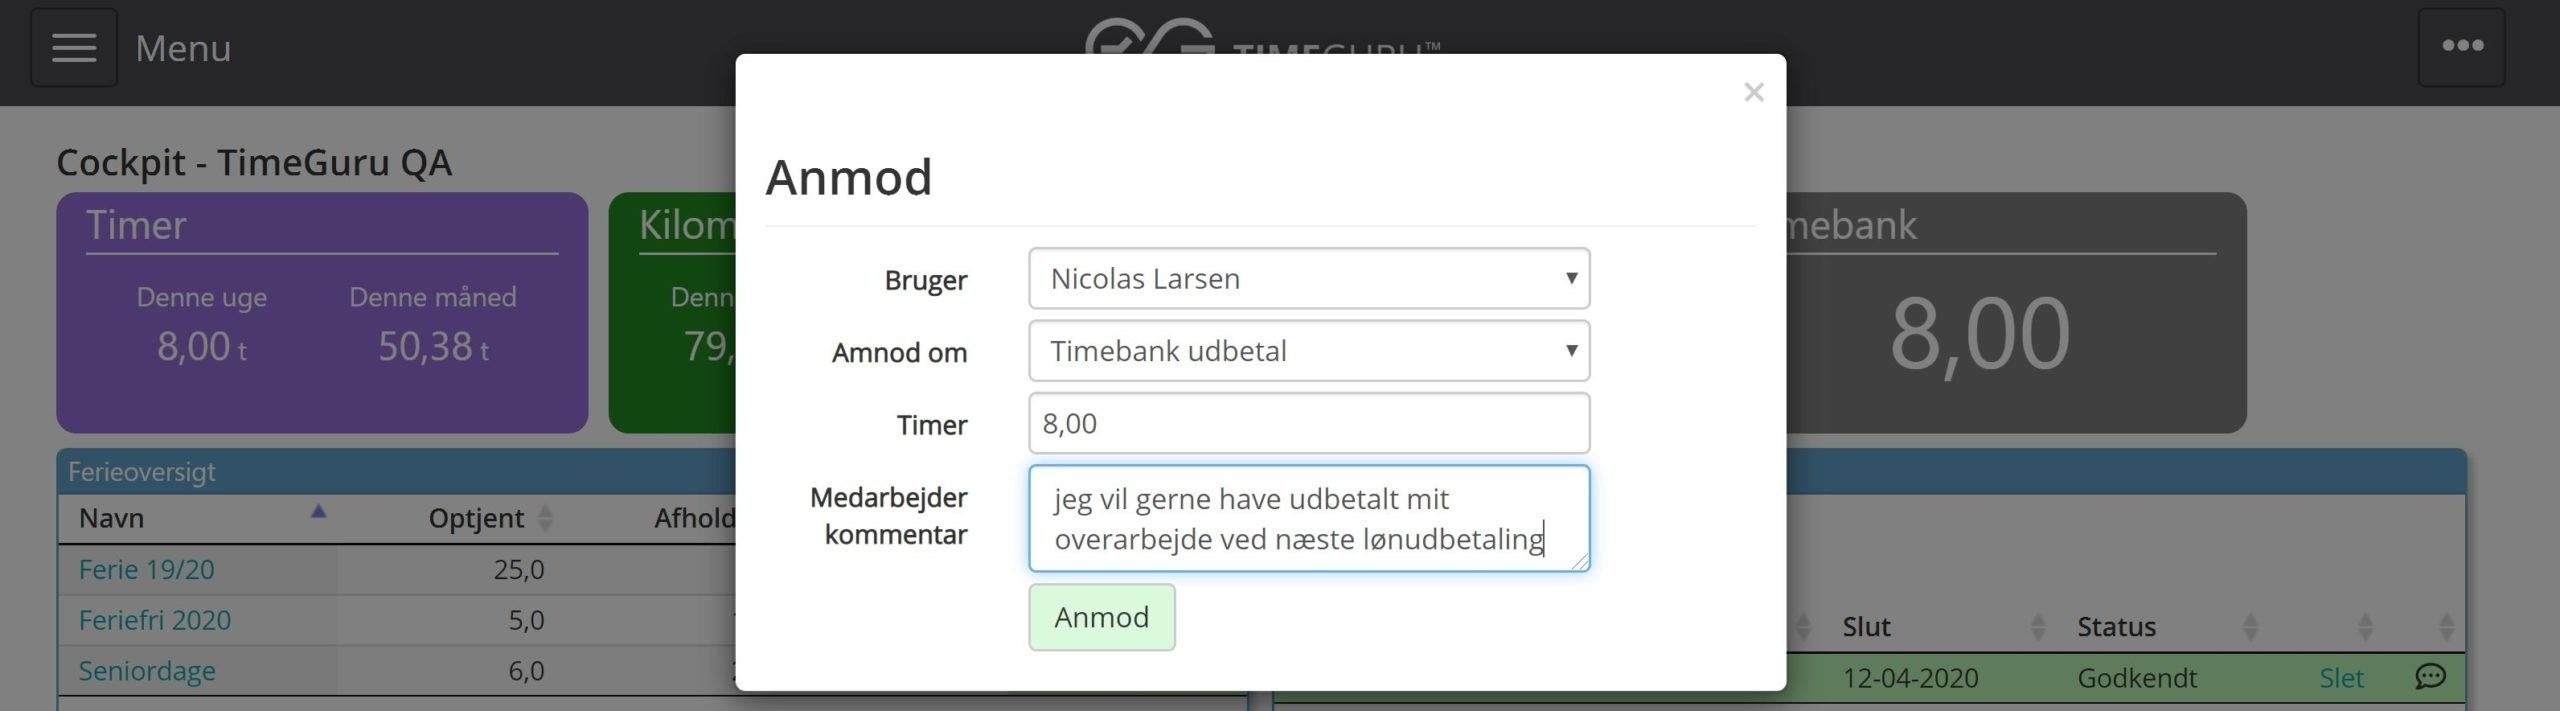 Timebank anmod